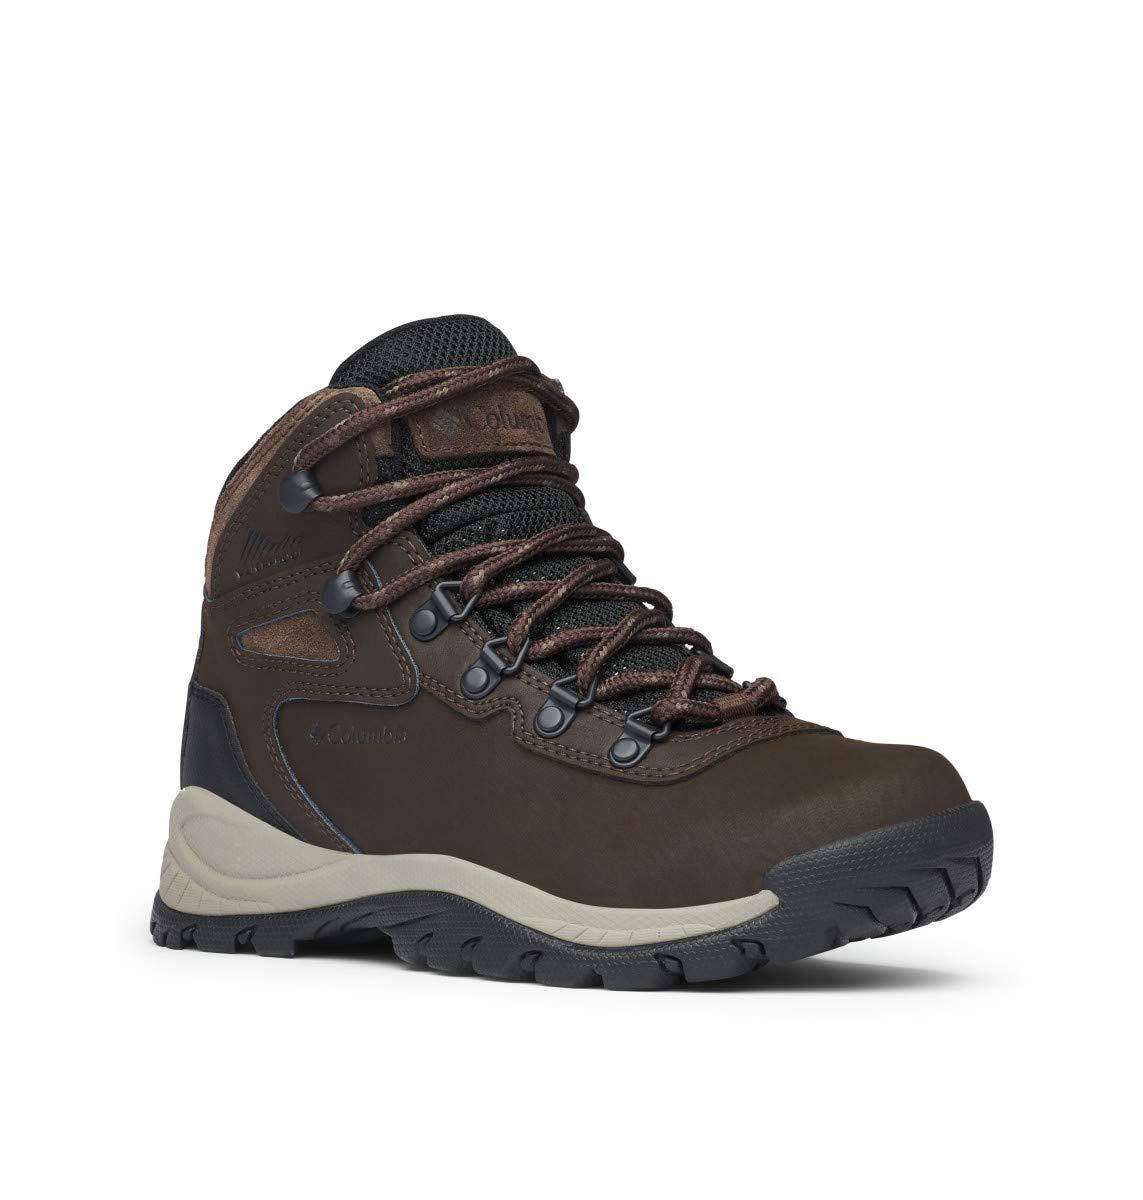 Columbia Women's Newton Ridge Plus Hiking Boot, Cordovan/Crown Jewel, 6.5 Regular US by Columbia